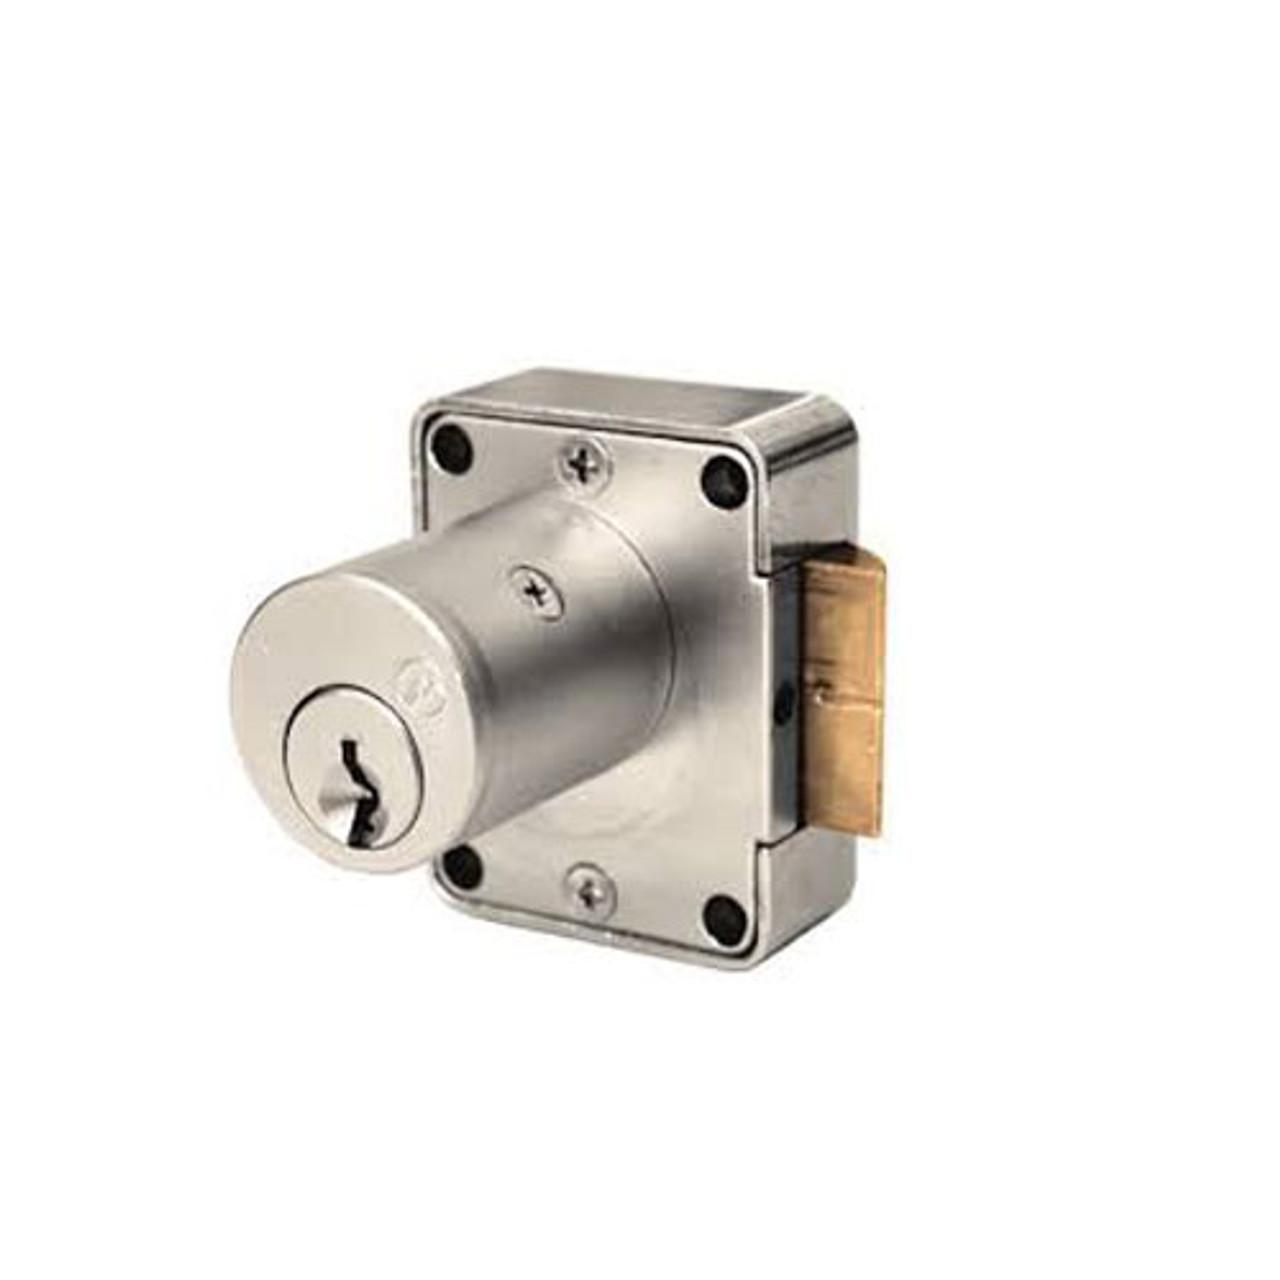 Olympus 999L-LH-KA101-26D-7/8 Cabinet Locks in Satin Chrome Finish